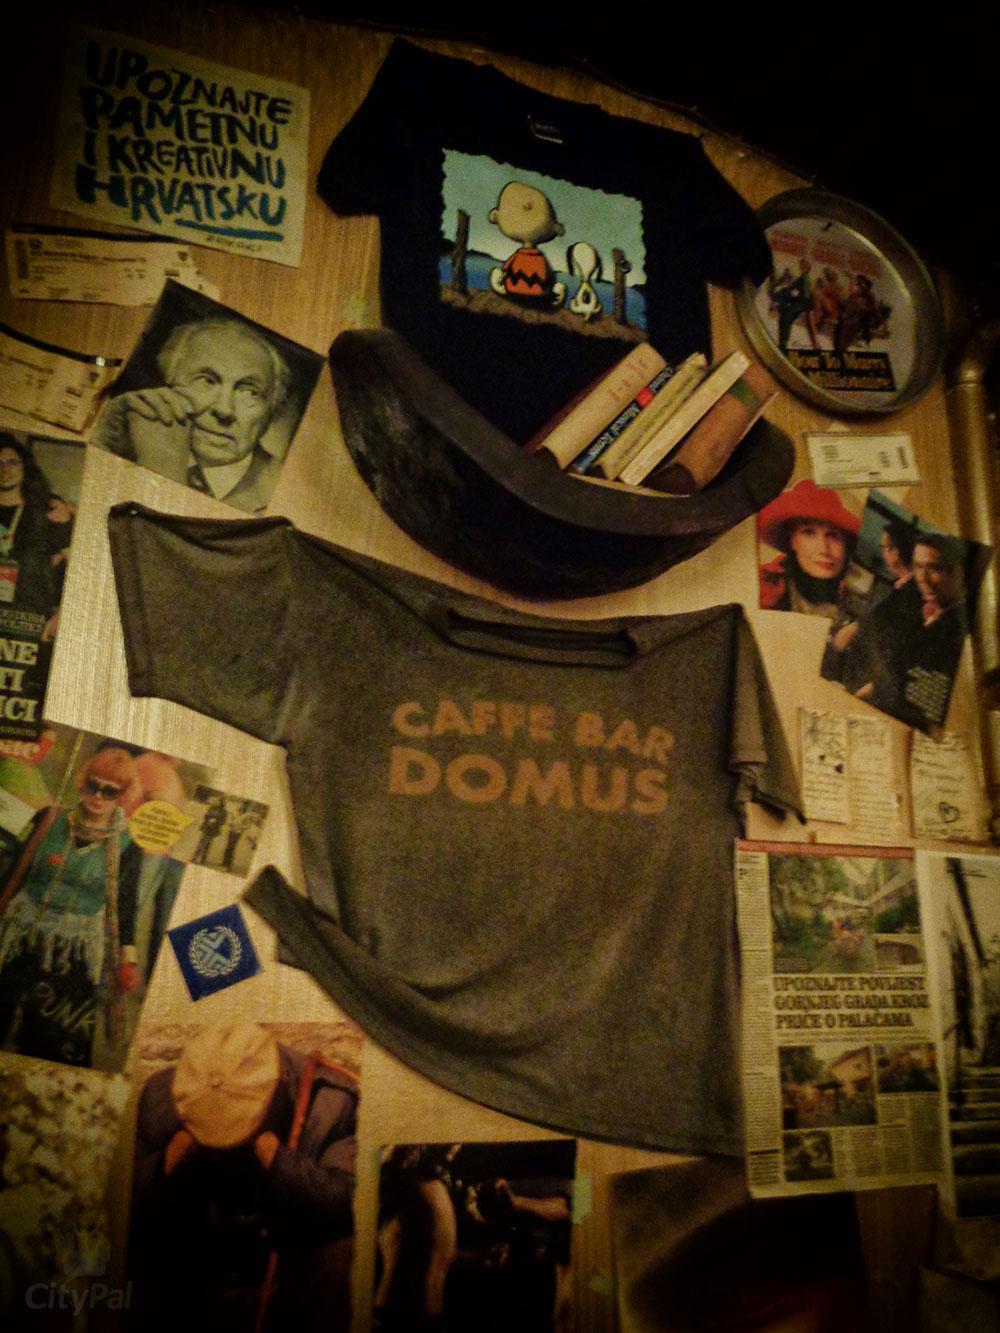 COFFEE_ZAGREB_DOMUS (7)